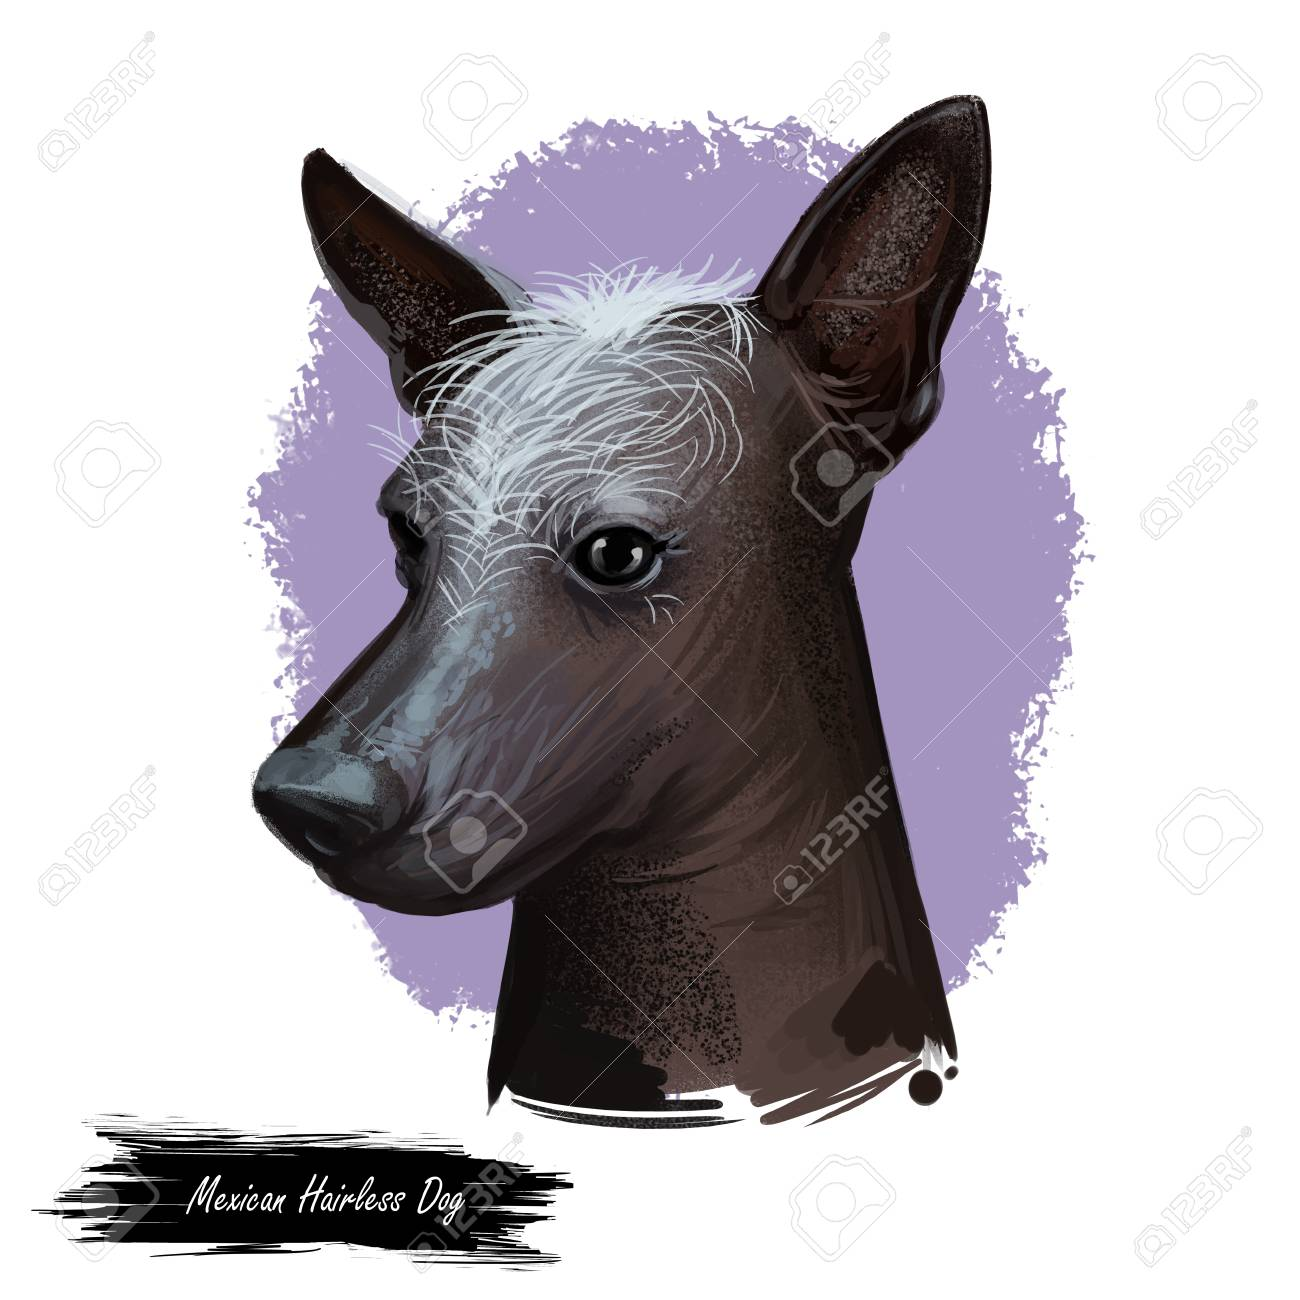 Mexican Hairless Dog Breed Xoloitzcuintli Digital Art Illustration